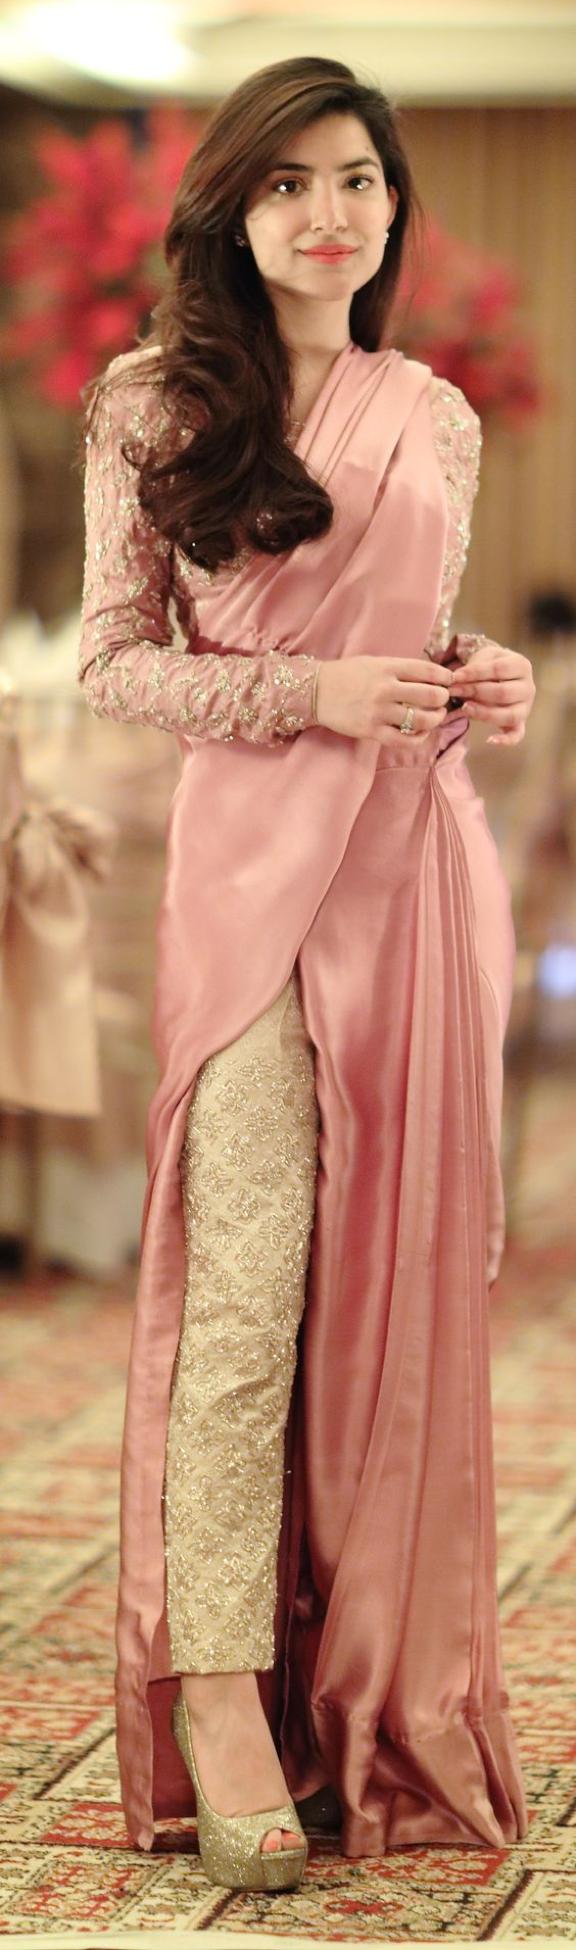 Pin by amanda boodram on indian designer wear pinterest indian